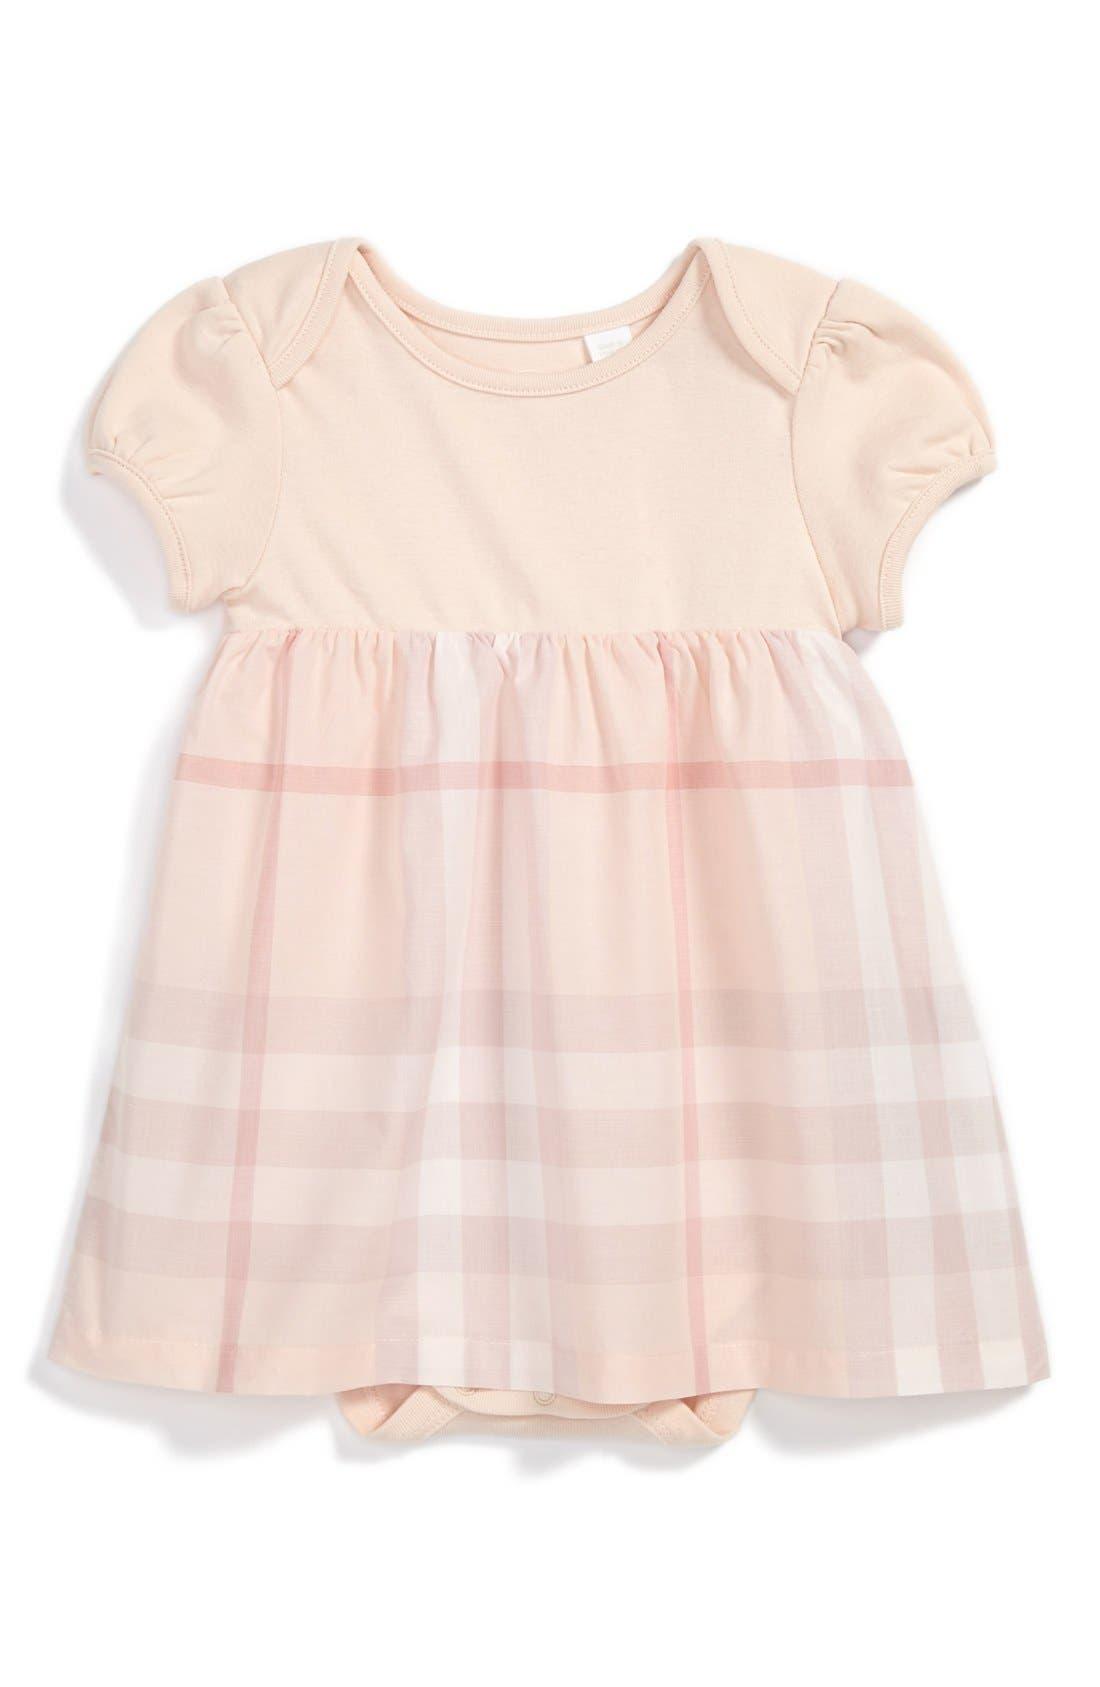 Alternate Image 1 Selected - Burberry 'Cherrylina' Knit & Woven Dress (Baby Girls)